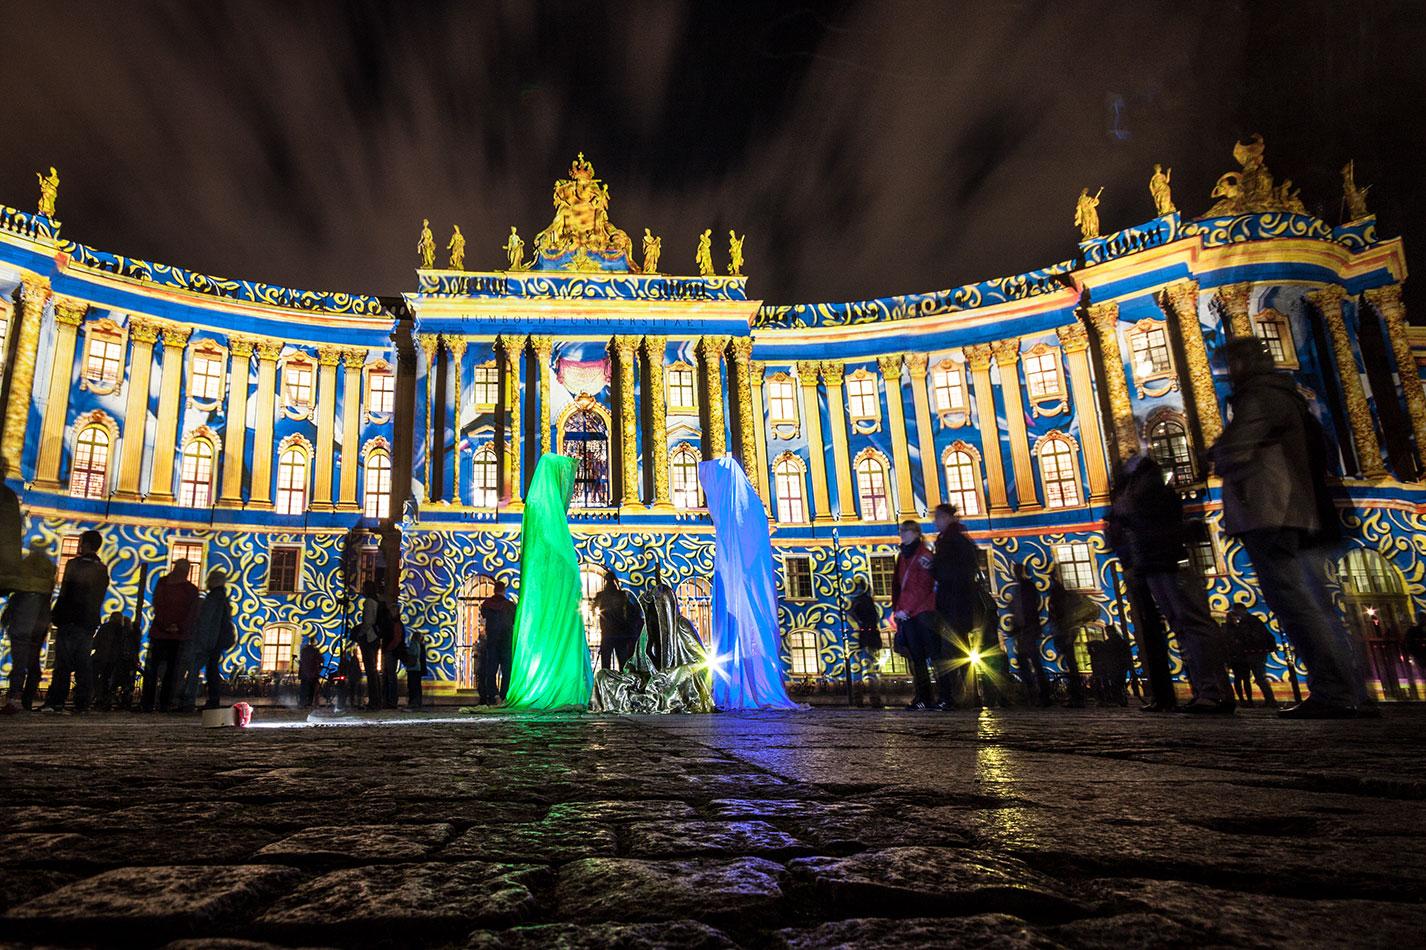 festival-of-lights-berlin-humboldt-university-light-art-show-exhibition-lumina-guardians-of-time-manfred-kili-kielnhofer-contemporary-arts-design-sculpture-3420